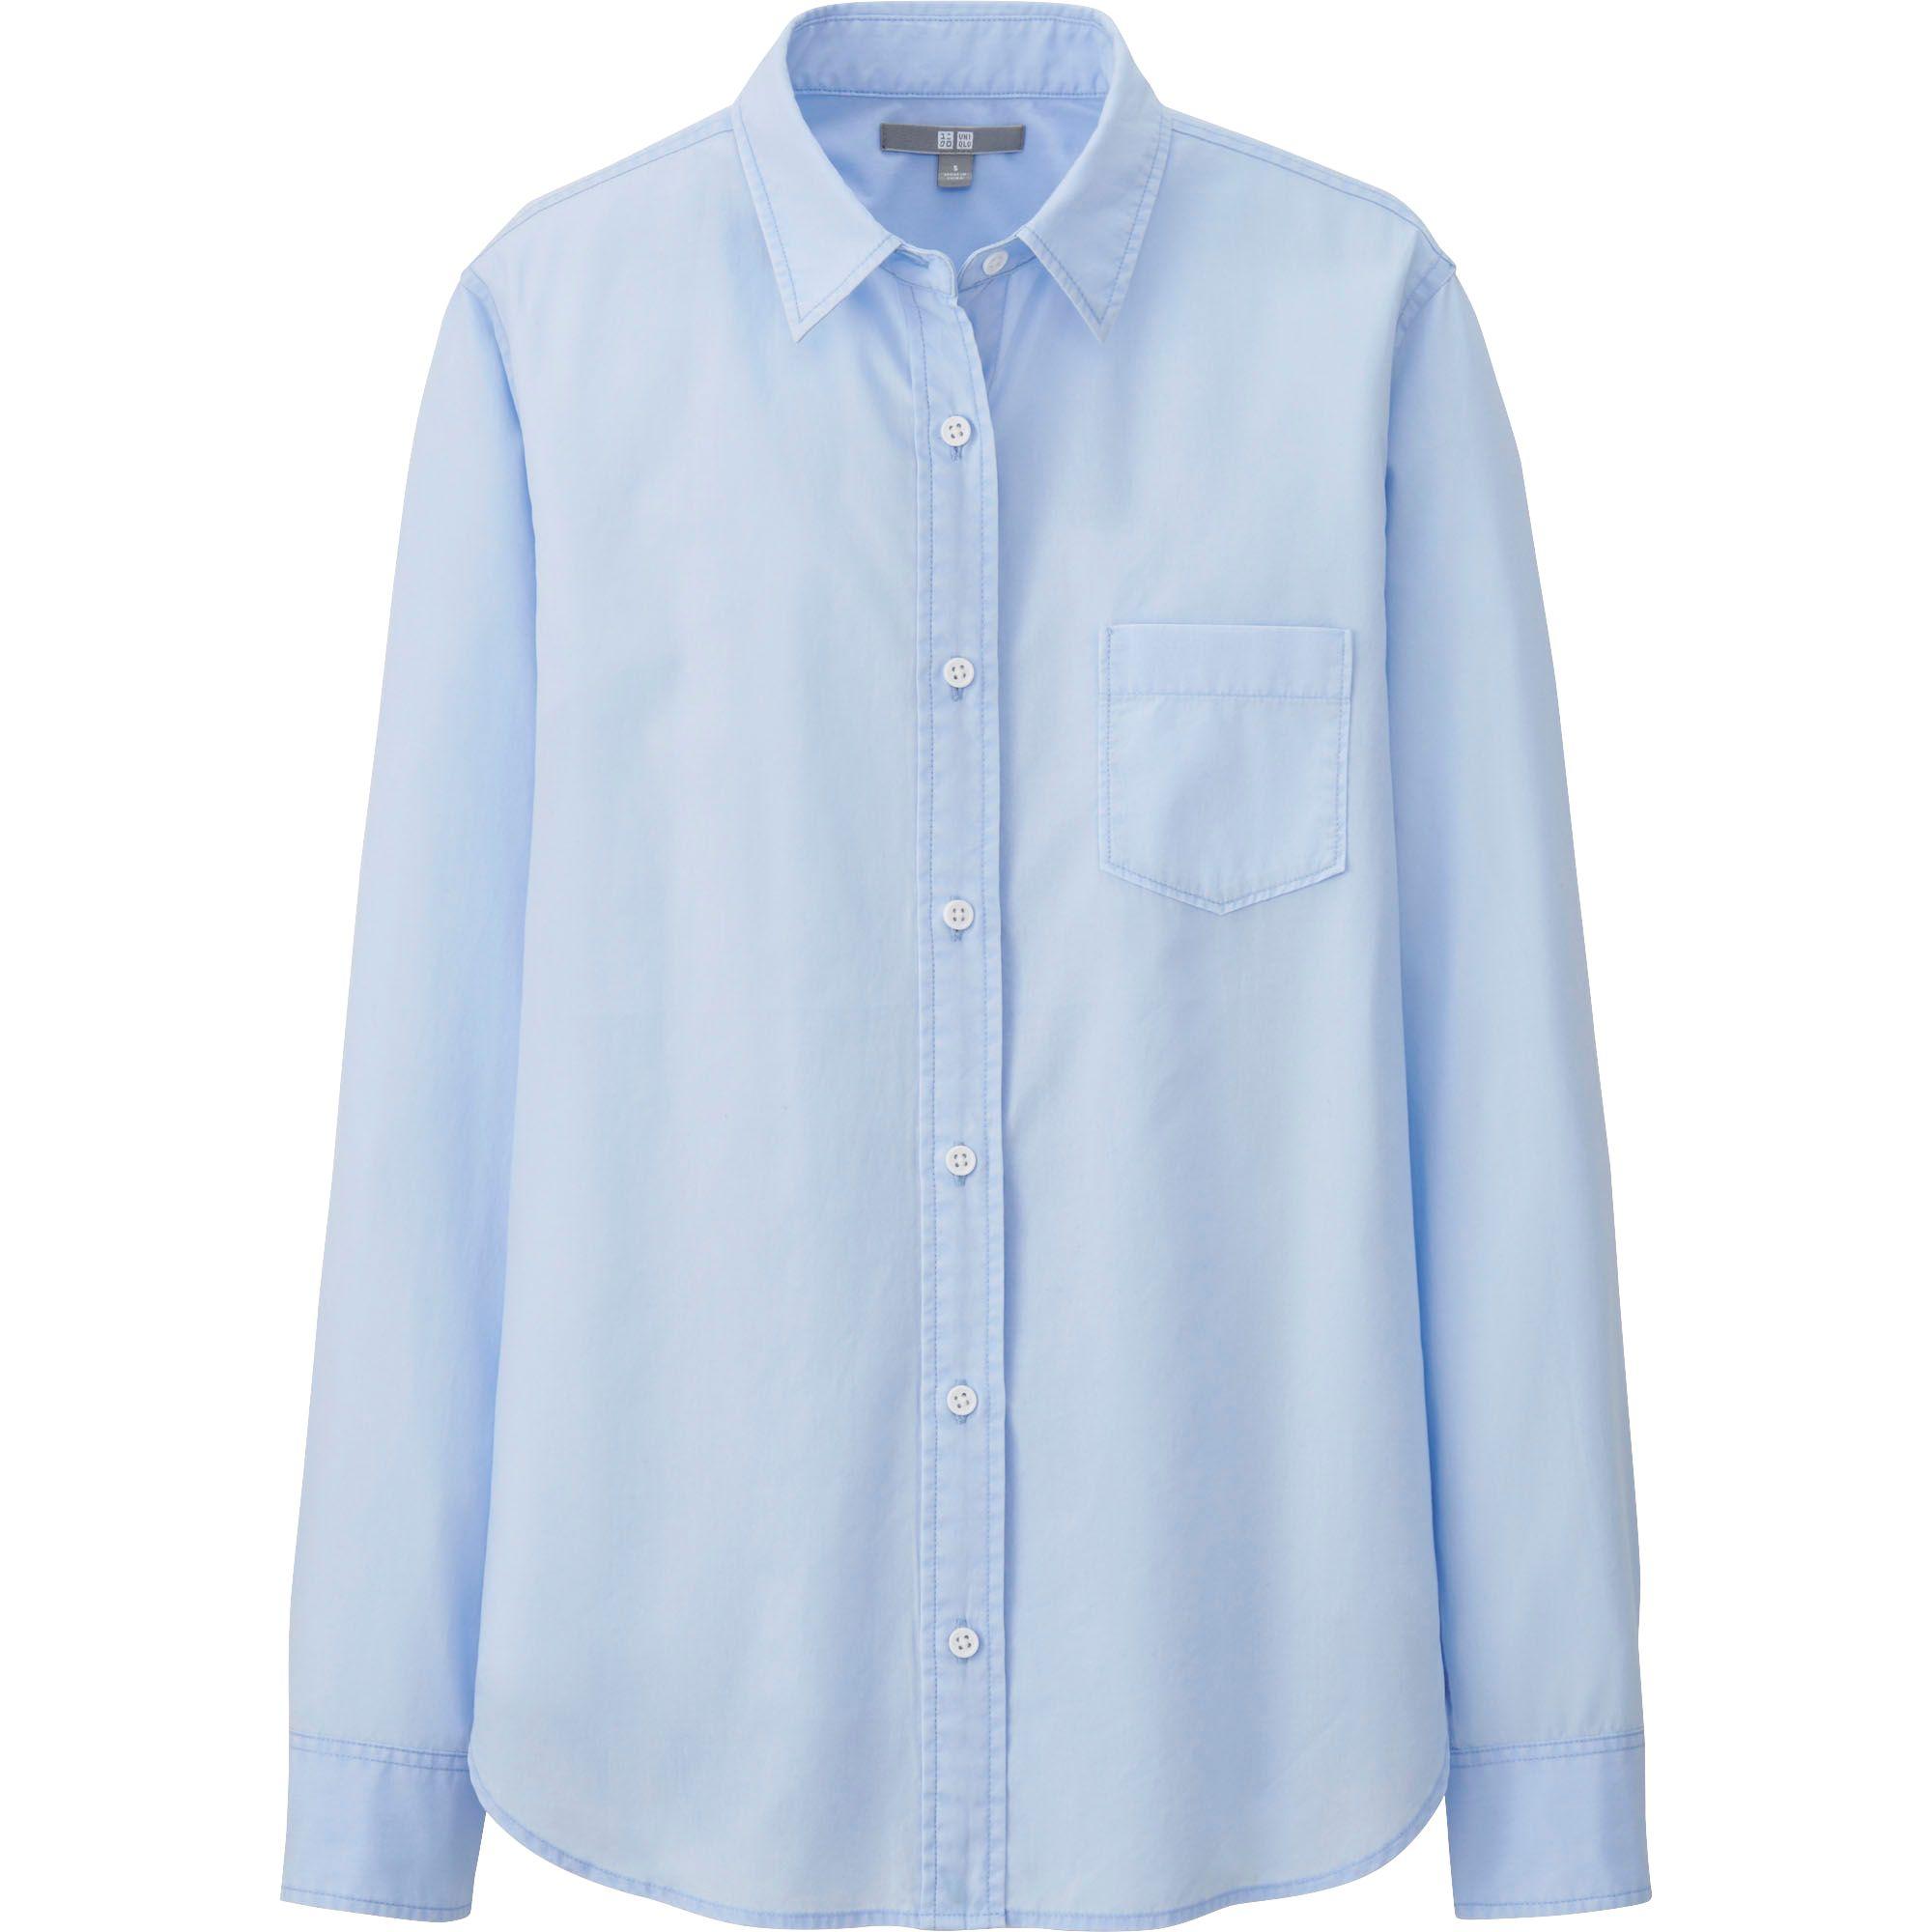 Uniqlo Women Extra Fine Cotton Broadcloth Long Sleeve